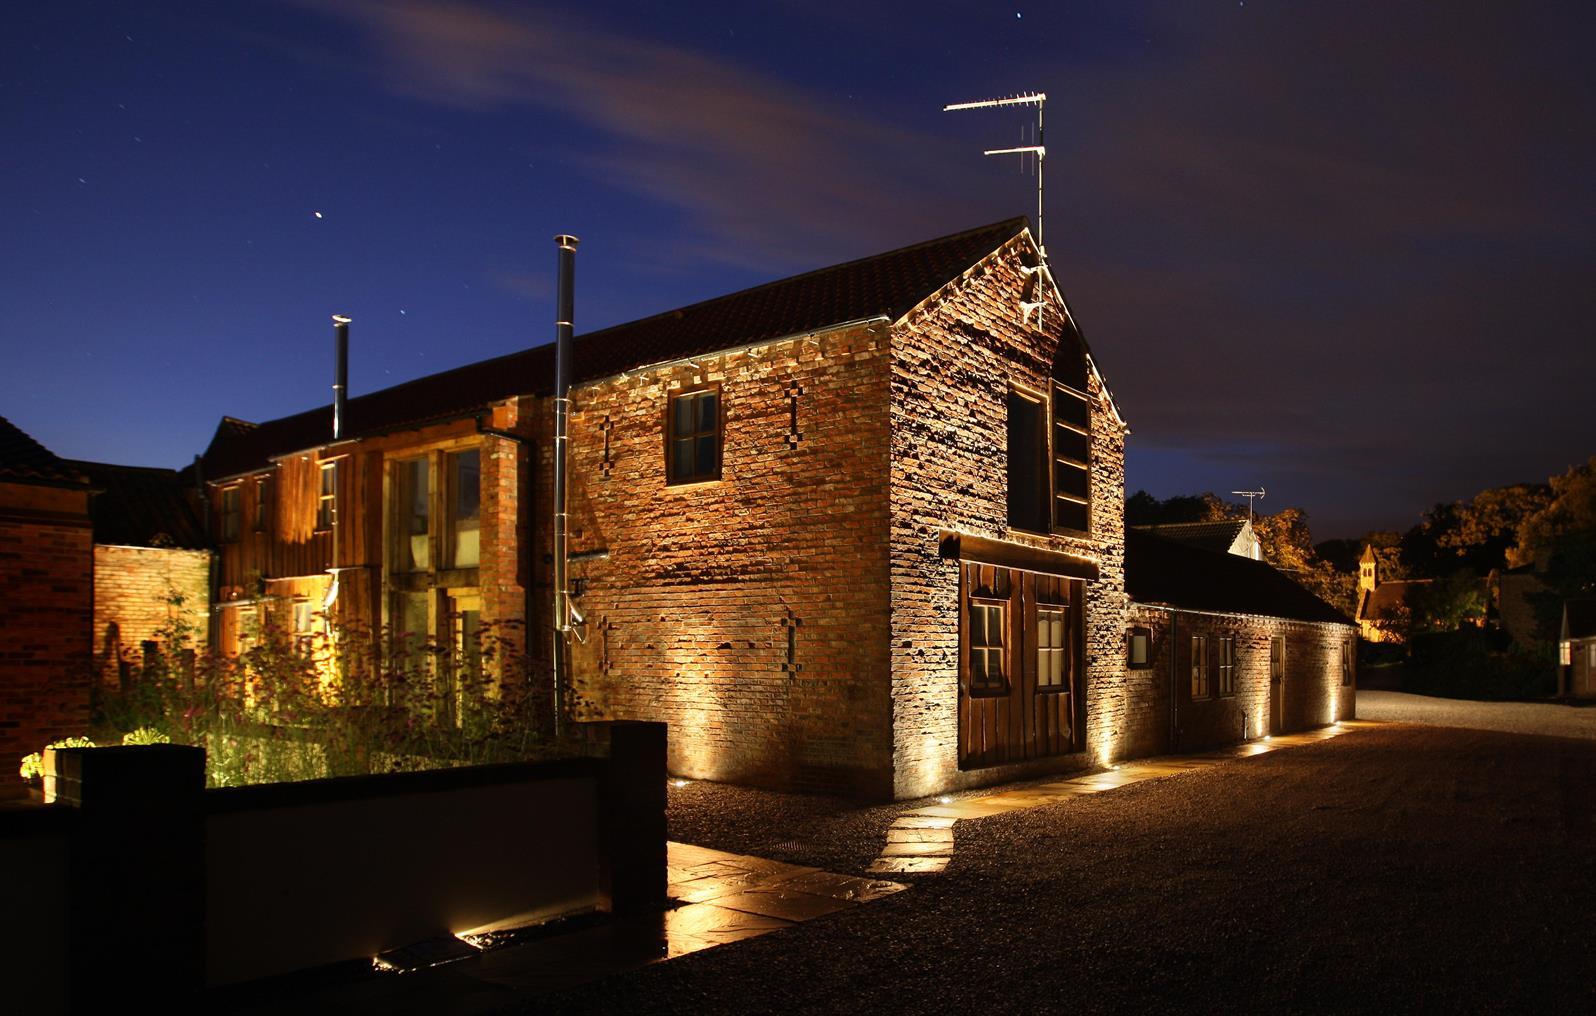 Bricknell Cottages exterior